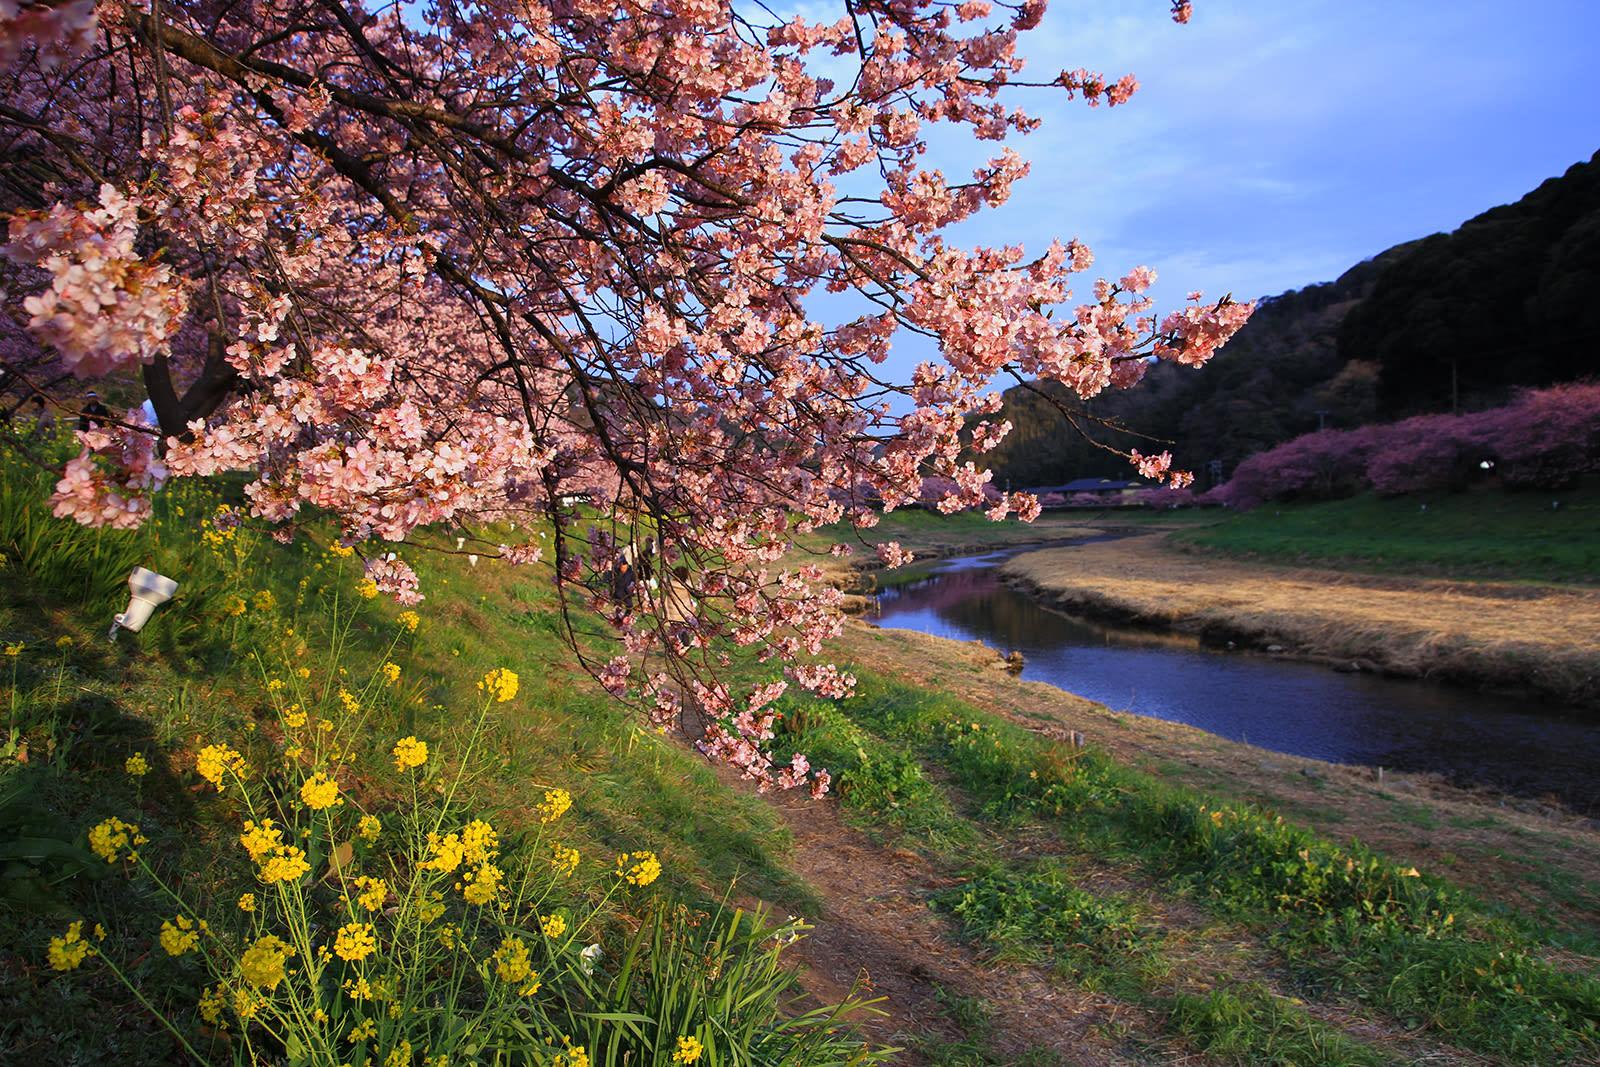 Ngắm Kawazu-zakura và trời sao tại Miurakaigan, Kanazawa-ken 5